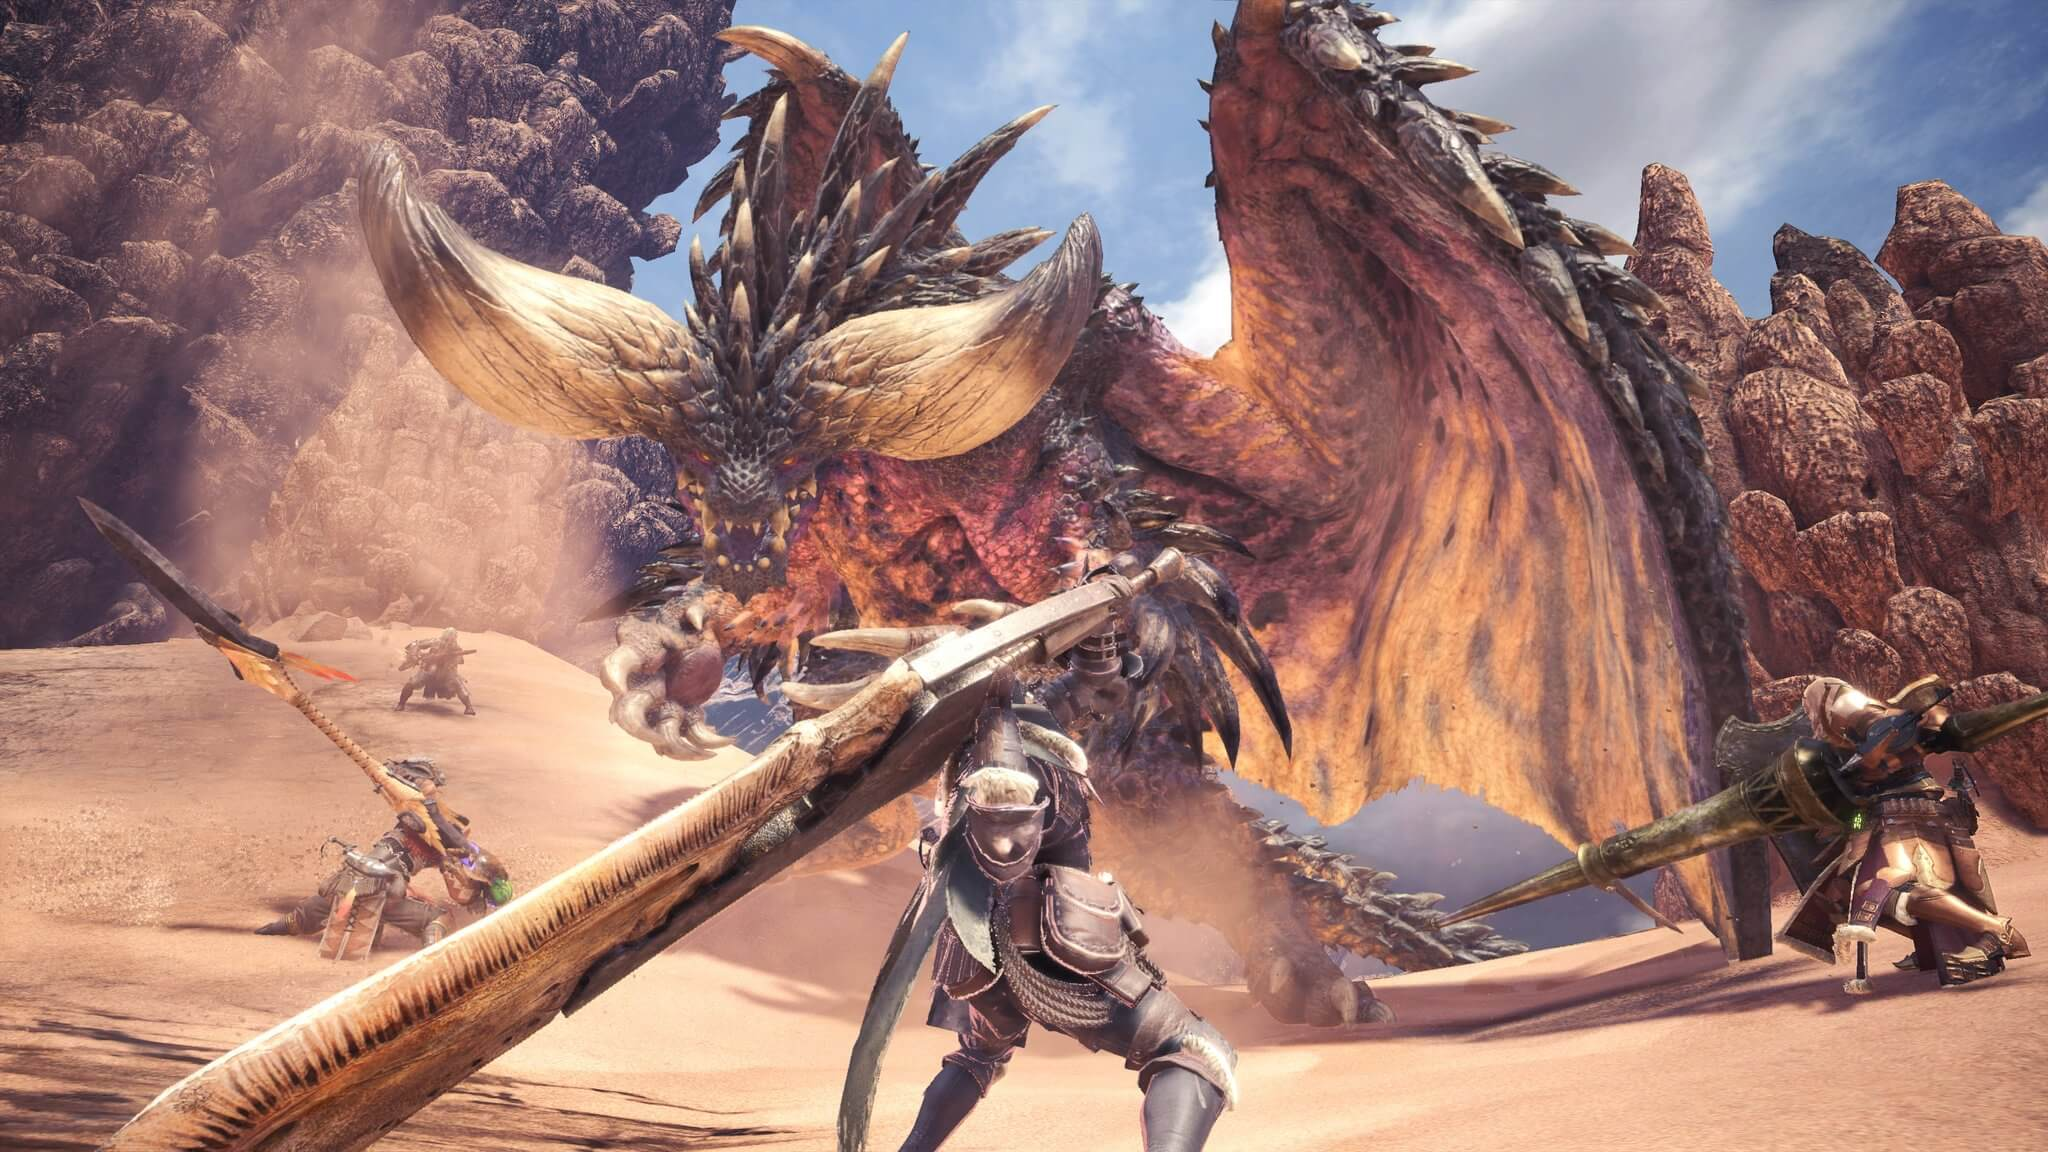 First Monster Hunter World mod released from Kaldaien